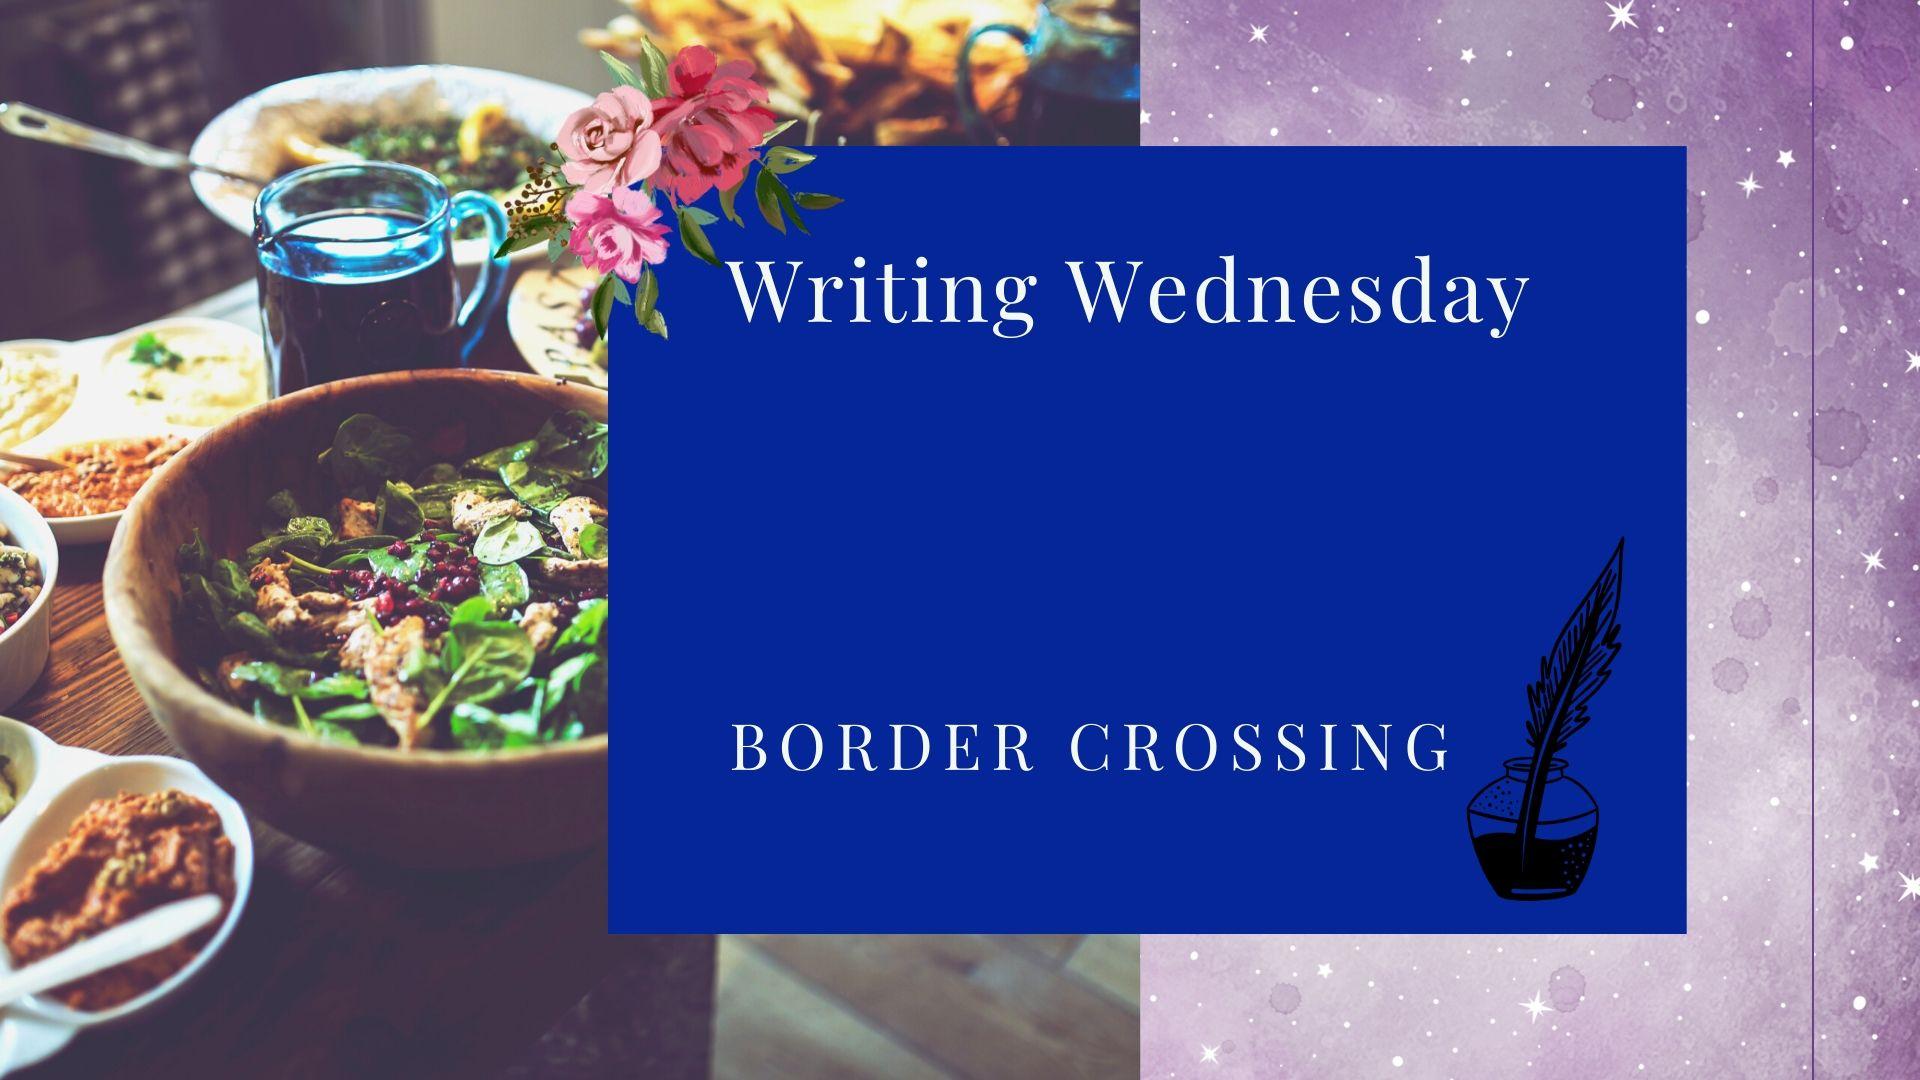 Writing Wednesday: Border Crossing